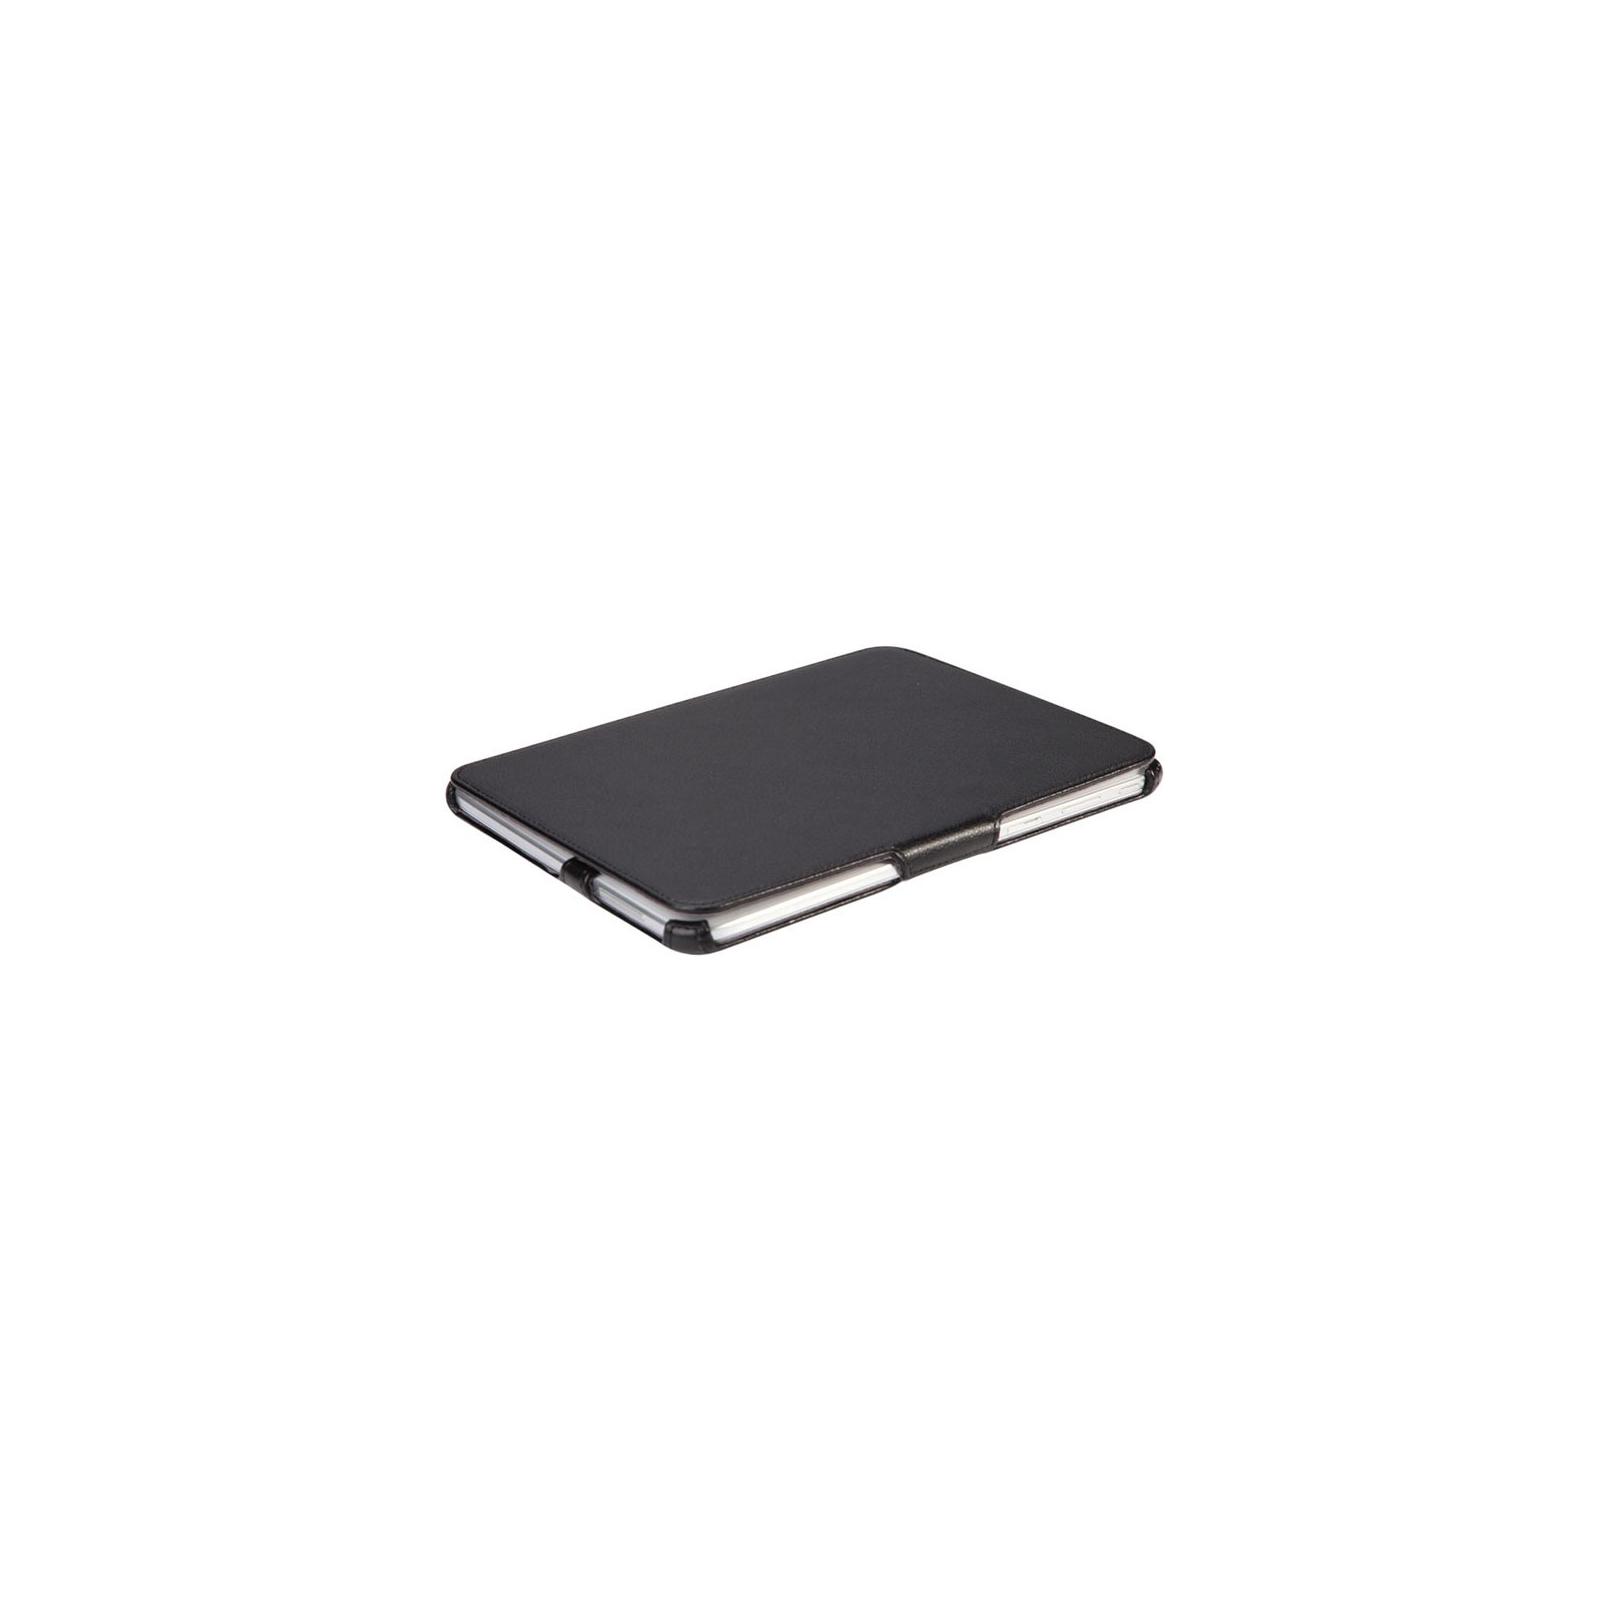 Чехол для планшета AirOn для Samsung GALAXY Tab 4 10.1 black (6946795850175) изображение 5